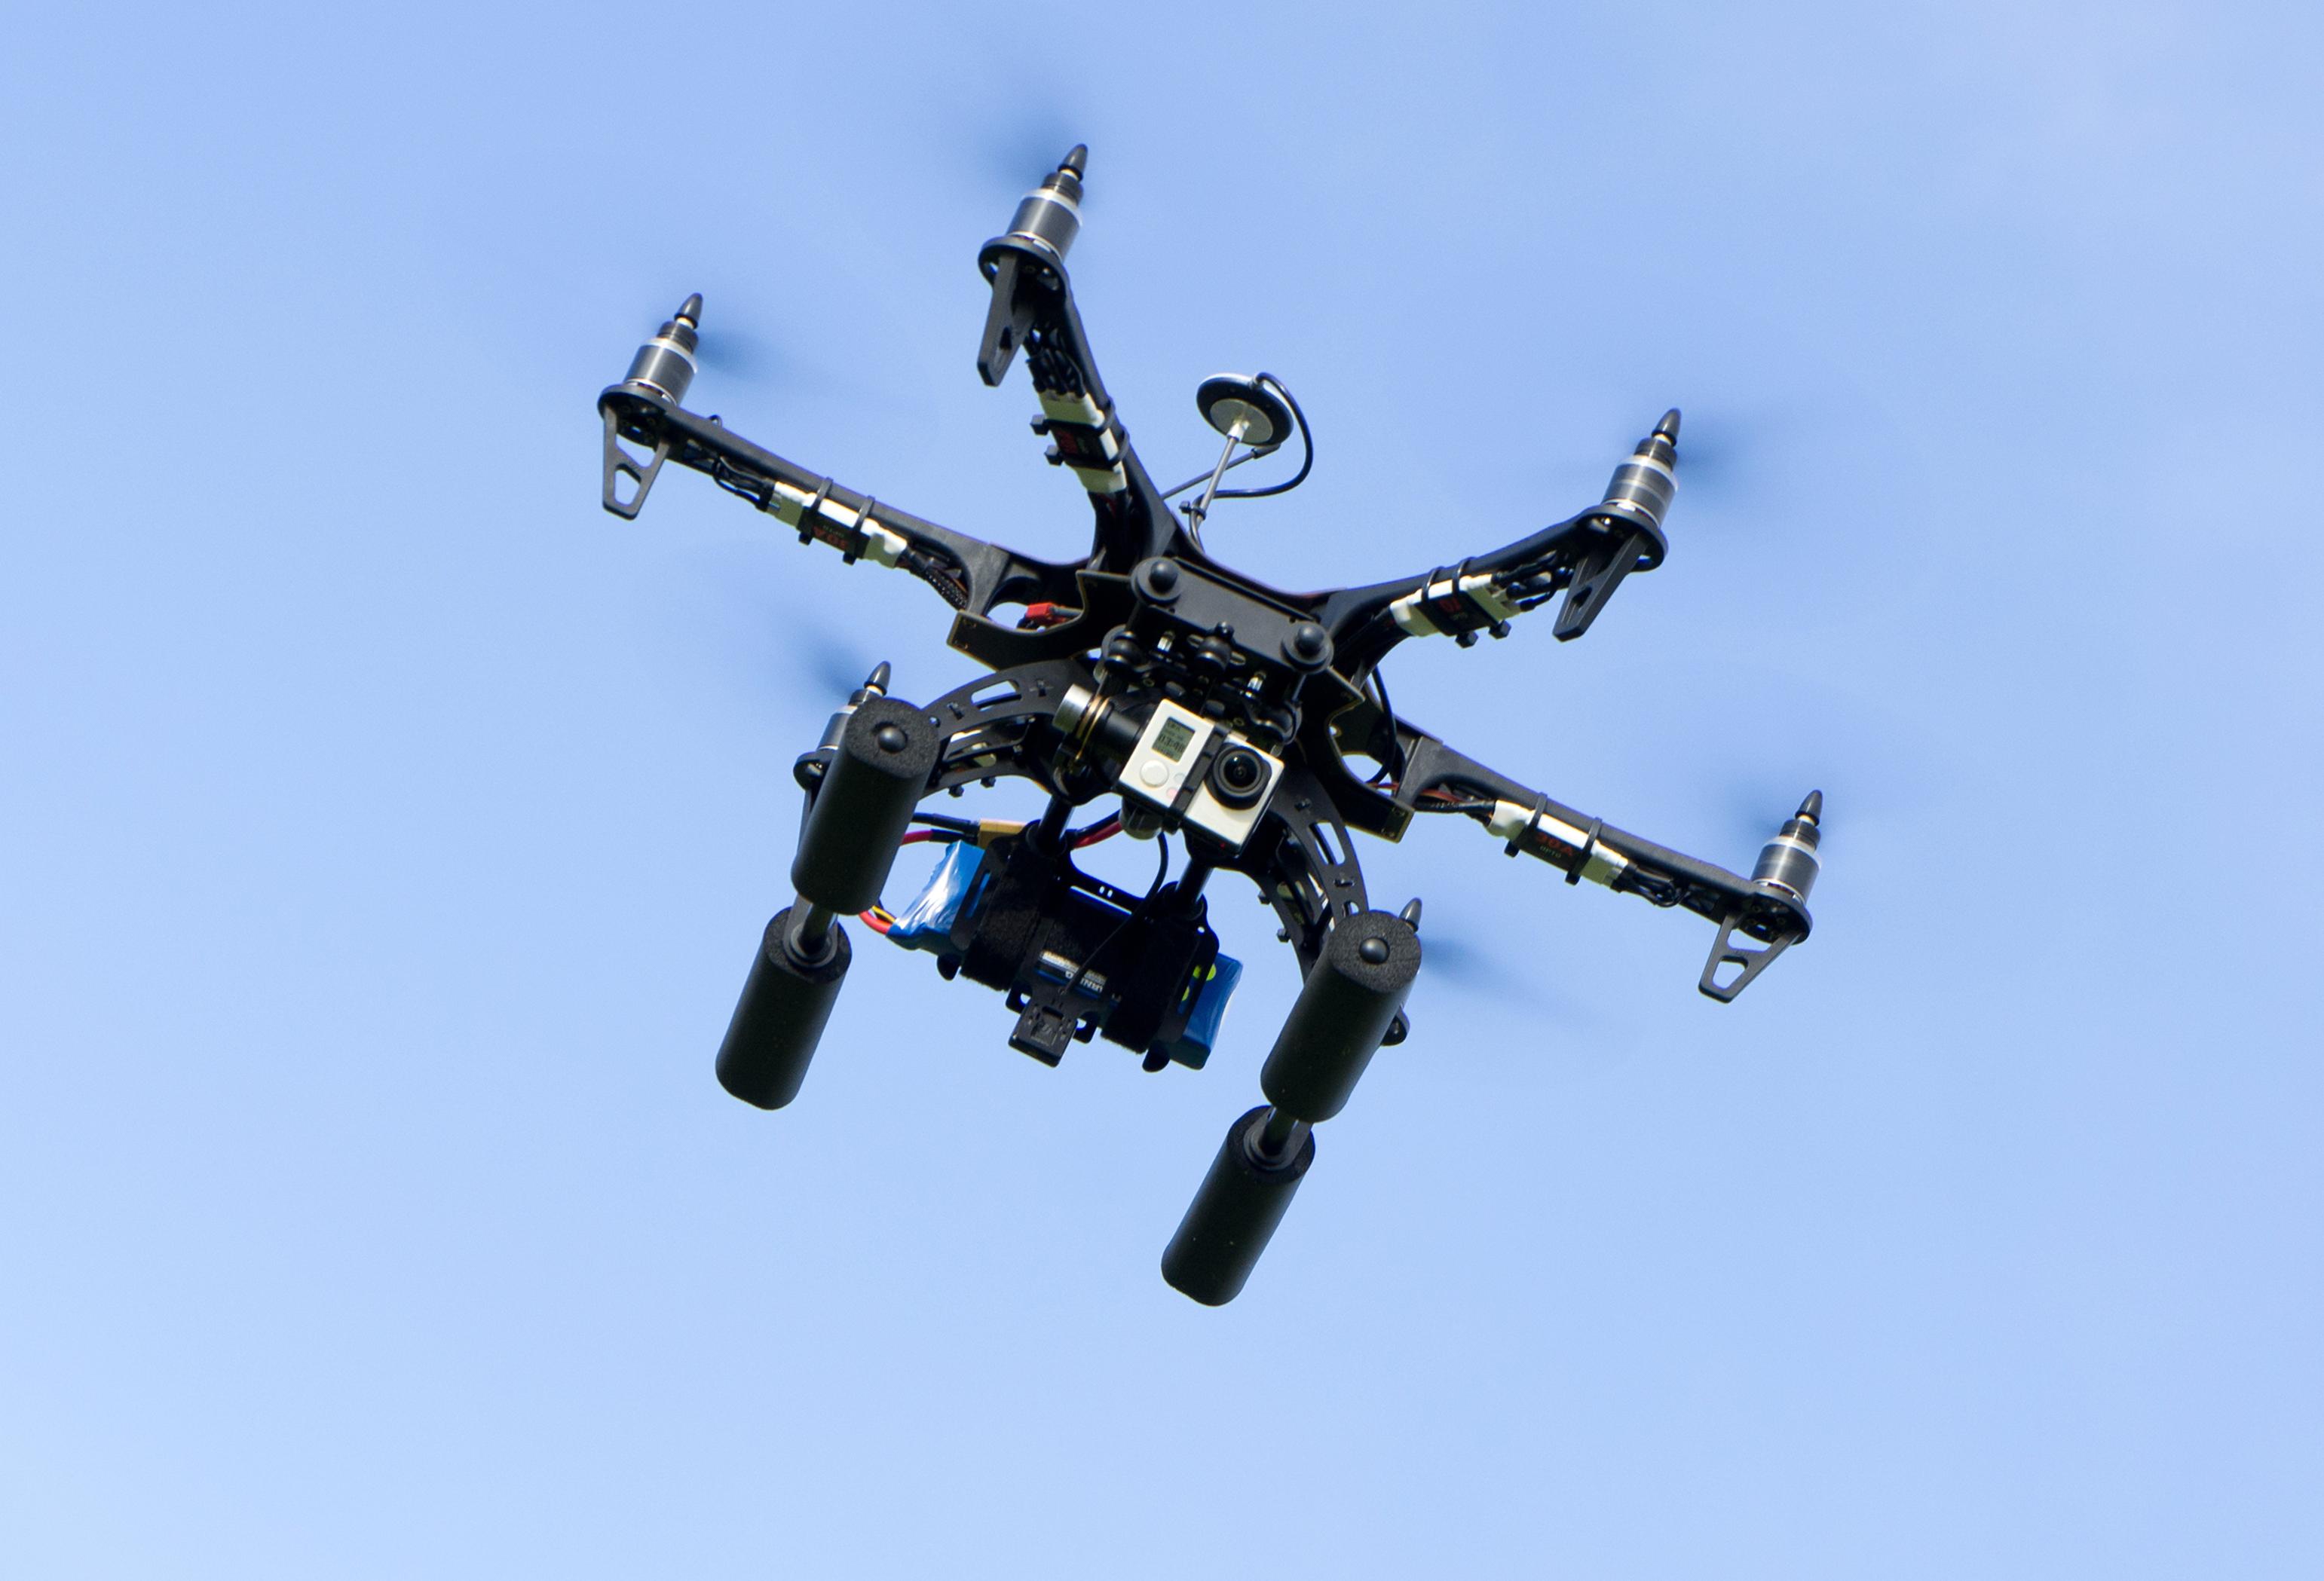 drone atlanta airport faa